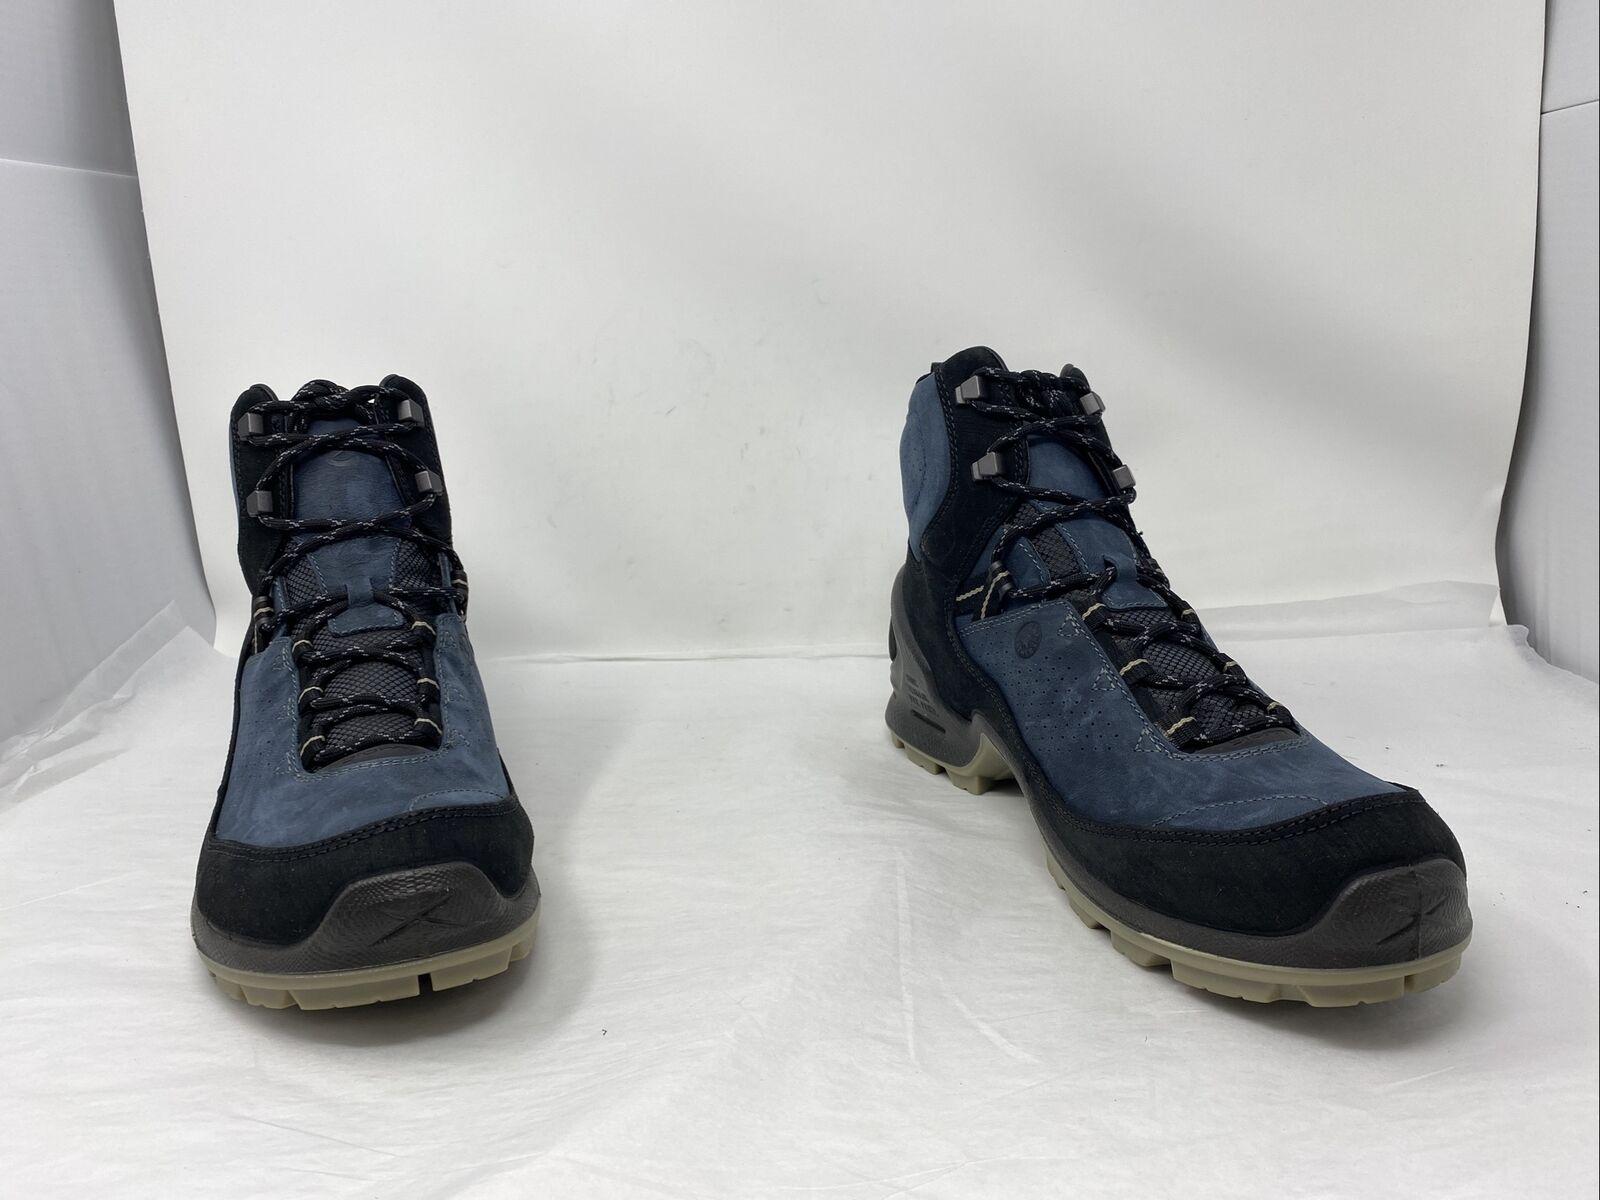 ECCO Mens Biom Terrain WP Hiking Boot Black/Blue/Grey Size 11M-11.5M US